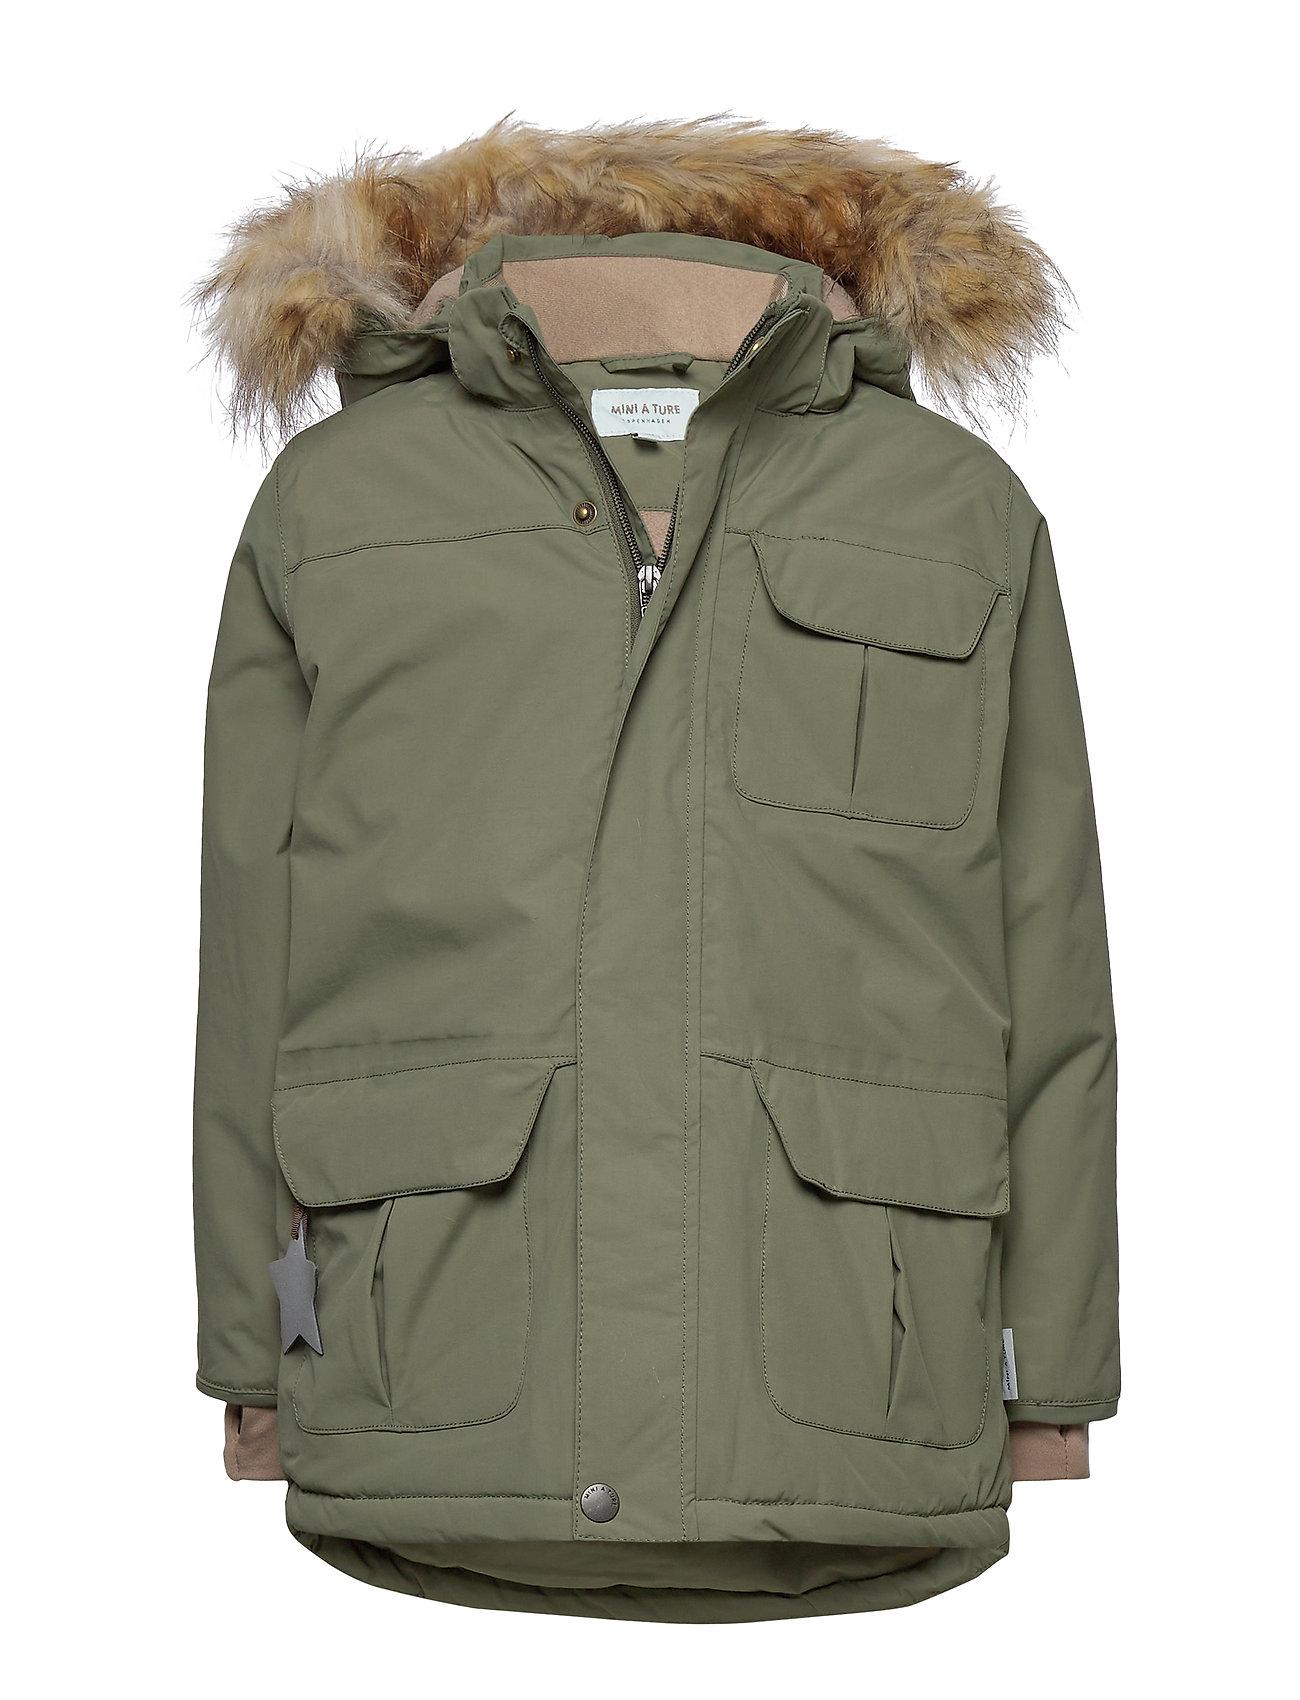 Mini A Ture Walder Faux Fur Jacket, K - BEETLE